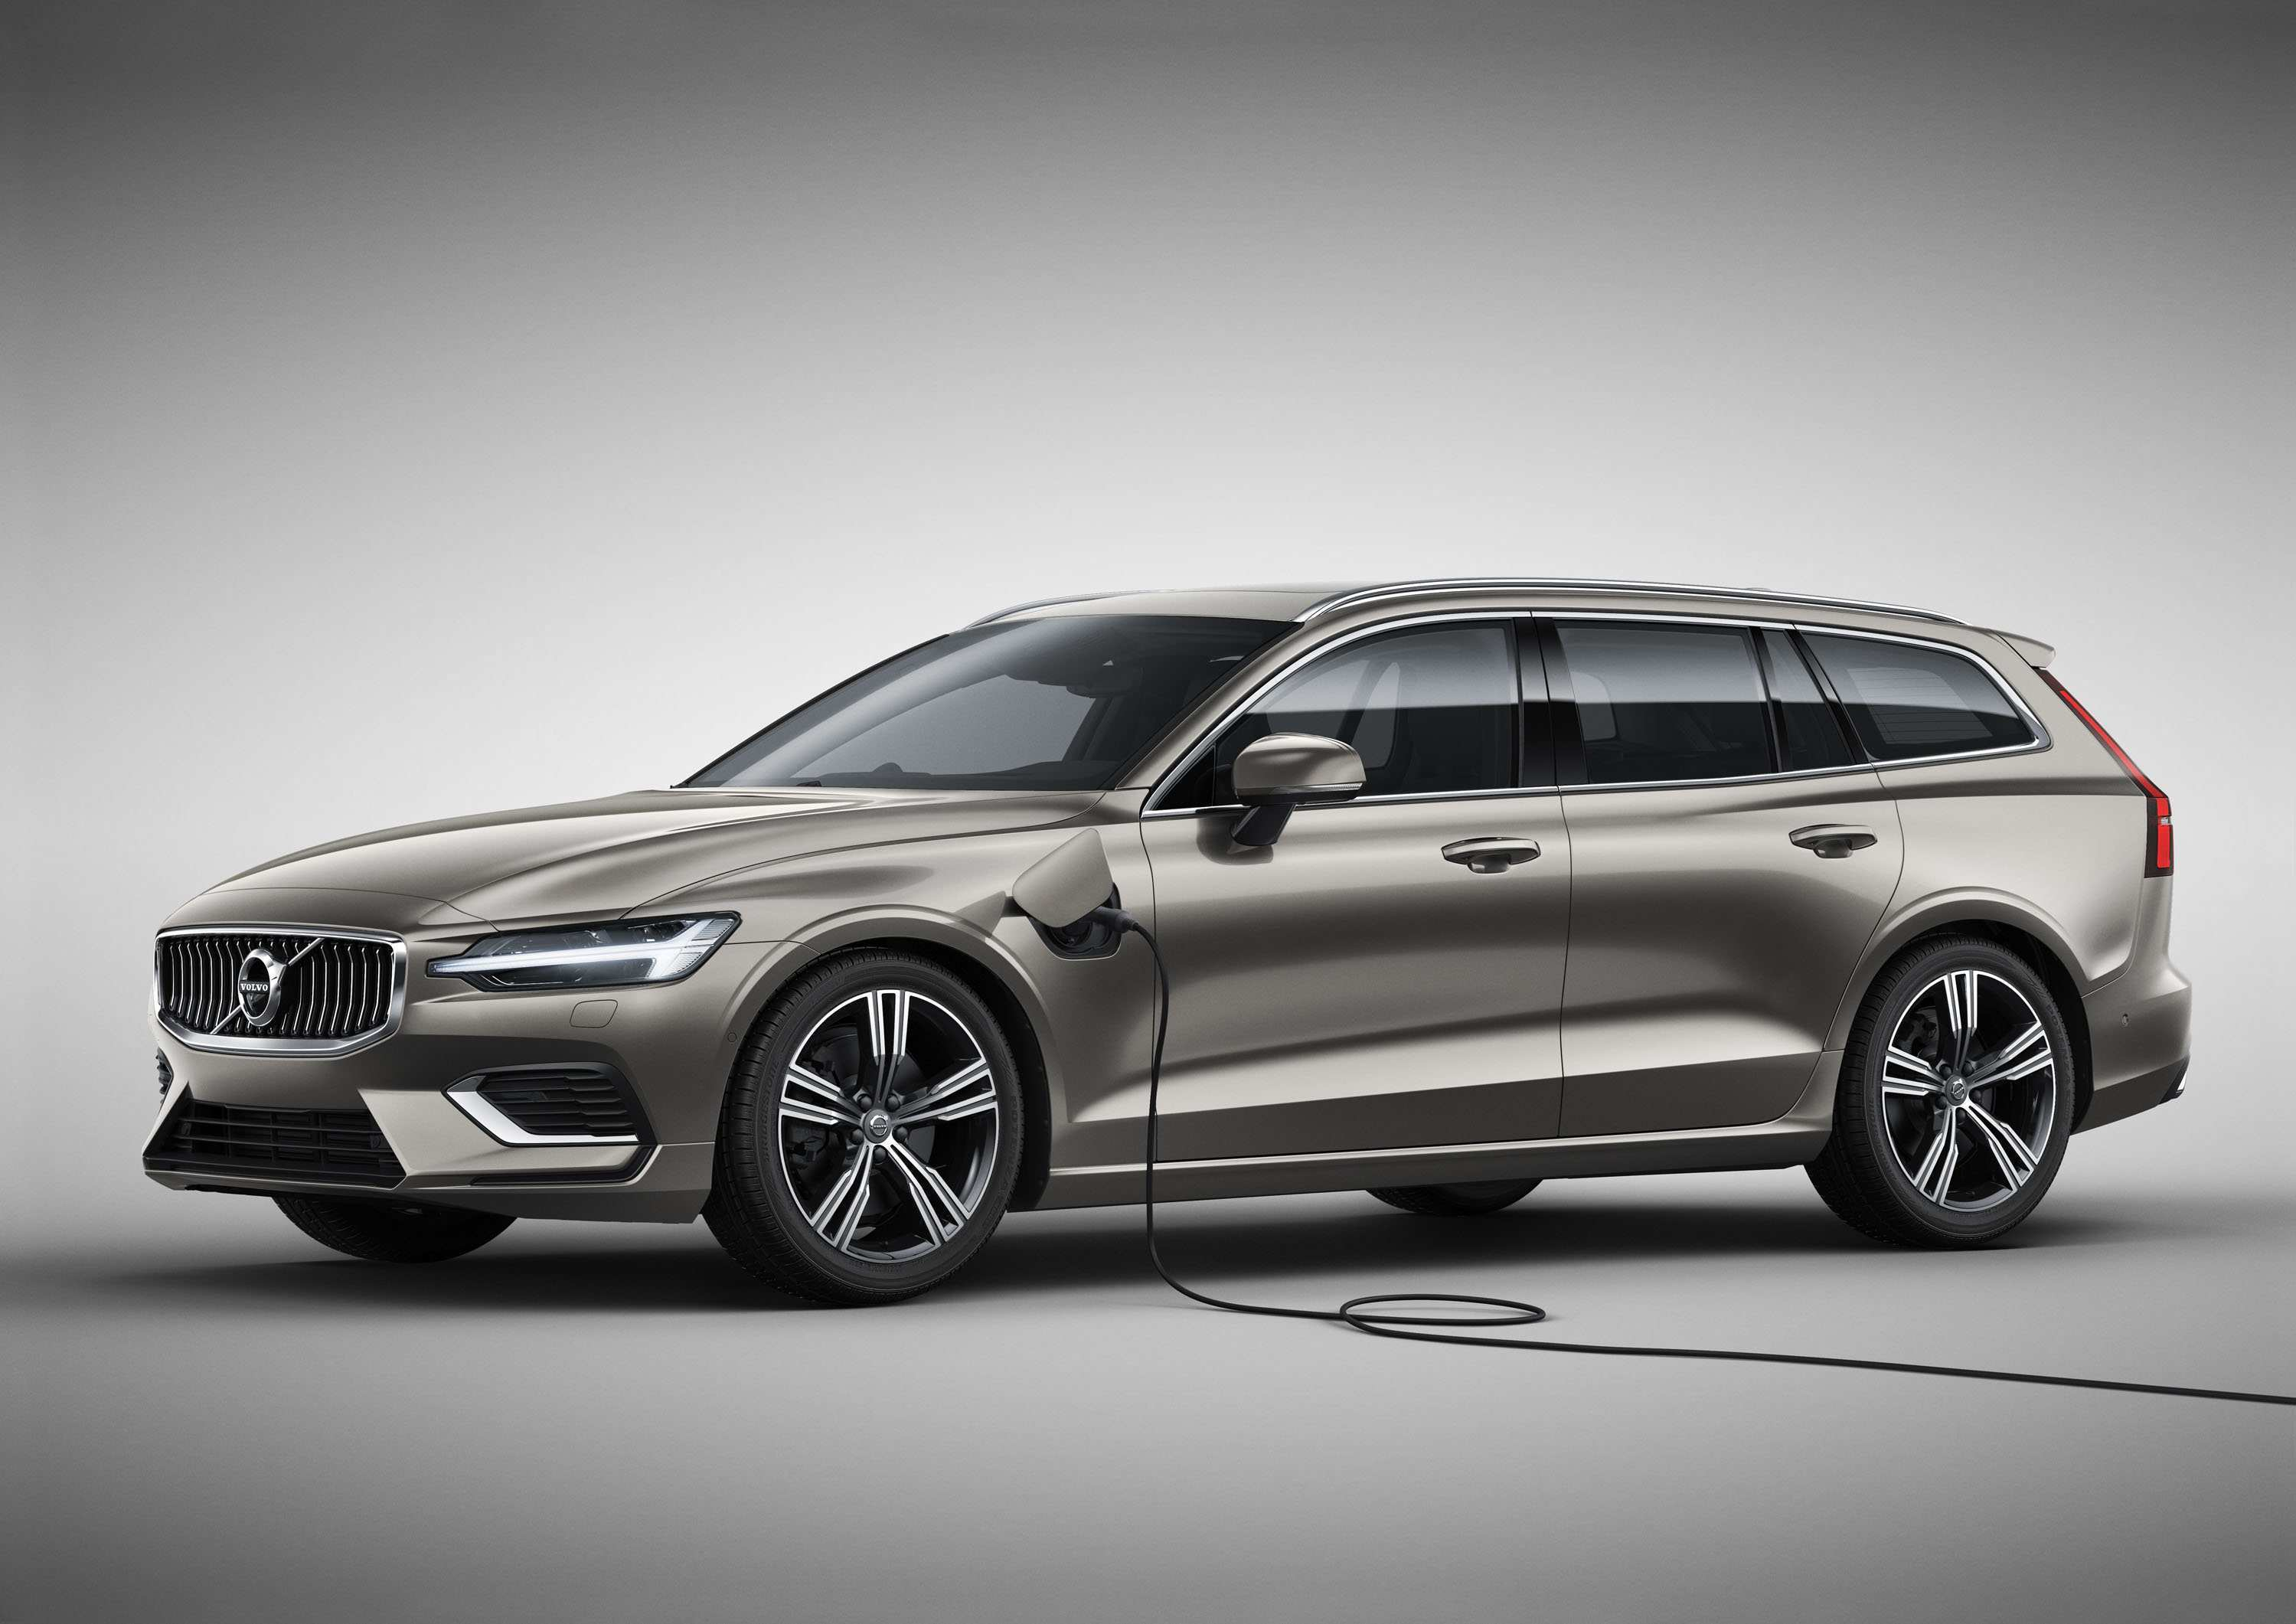 33 Concept of Volvo Wagon 2020 Spy Shoot for Volvo Wagon 2020